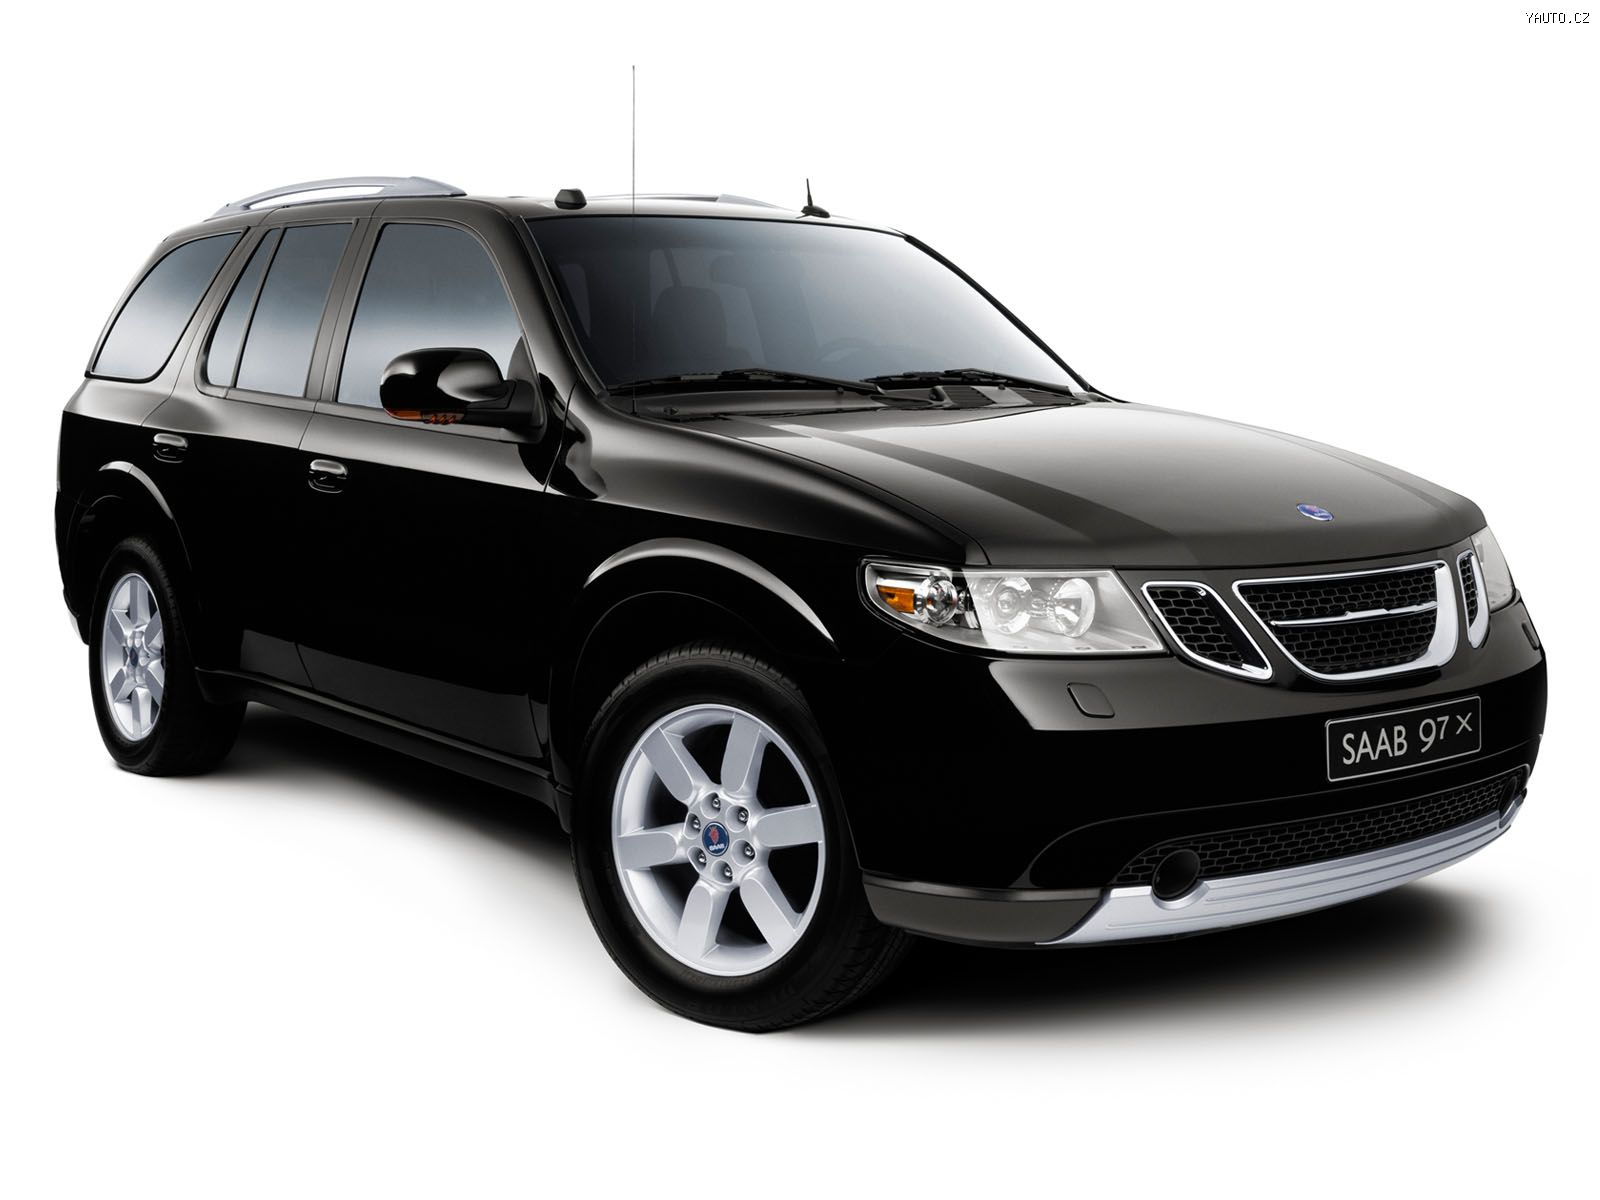 2004 Saab 9 3 further Saab 9 3 Convertible 2003 in addition 3066 Stanced Bmw 5 E39 likewise Police 20Car likewise Saab 9 7x 2006. on 2003 saab 9 3